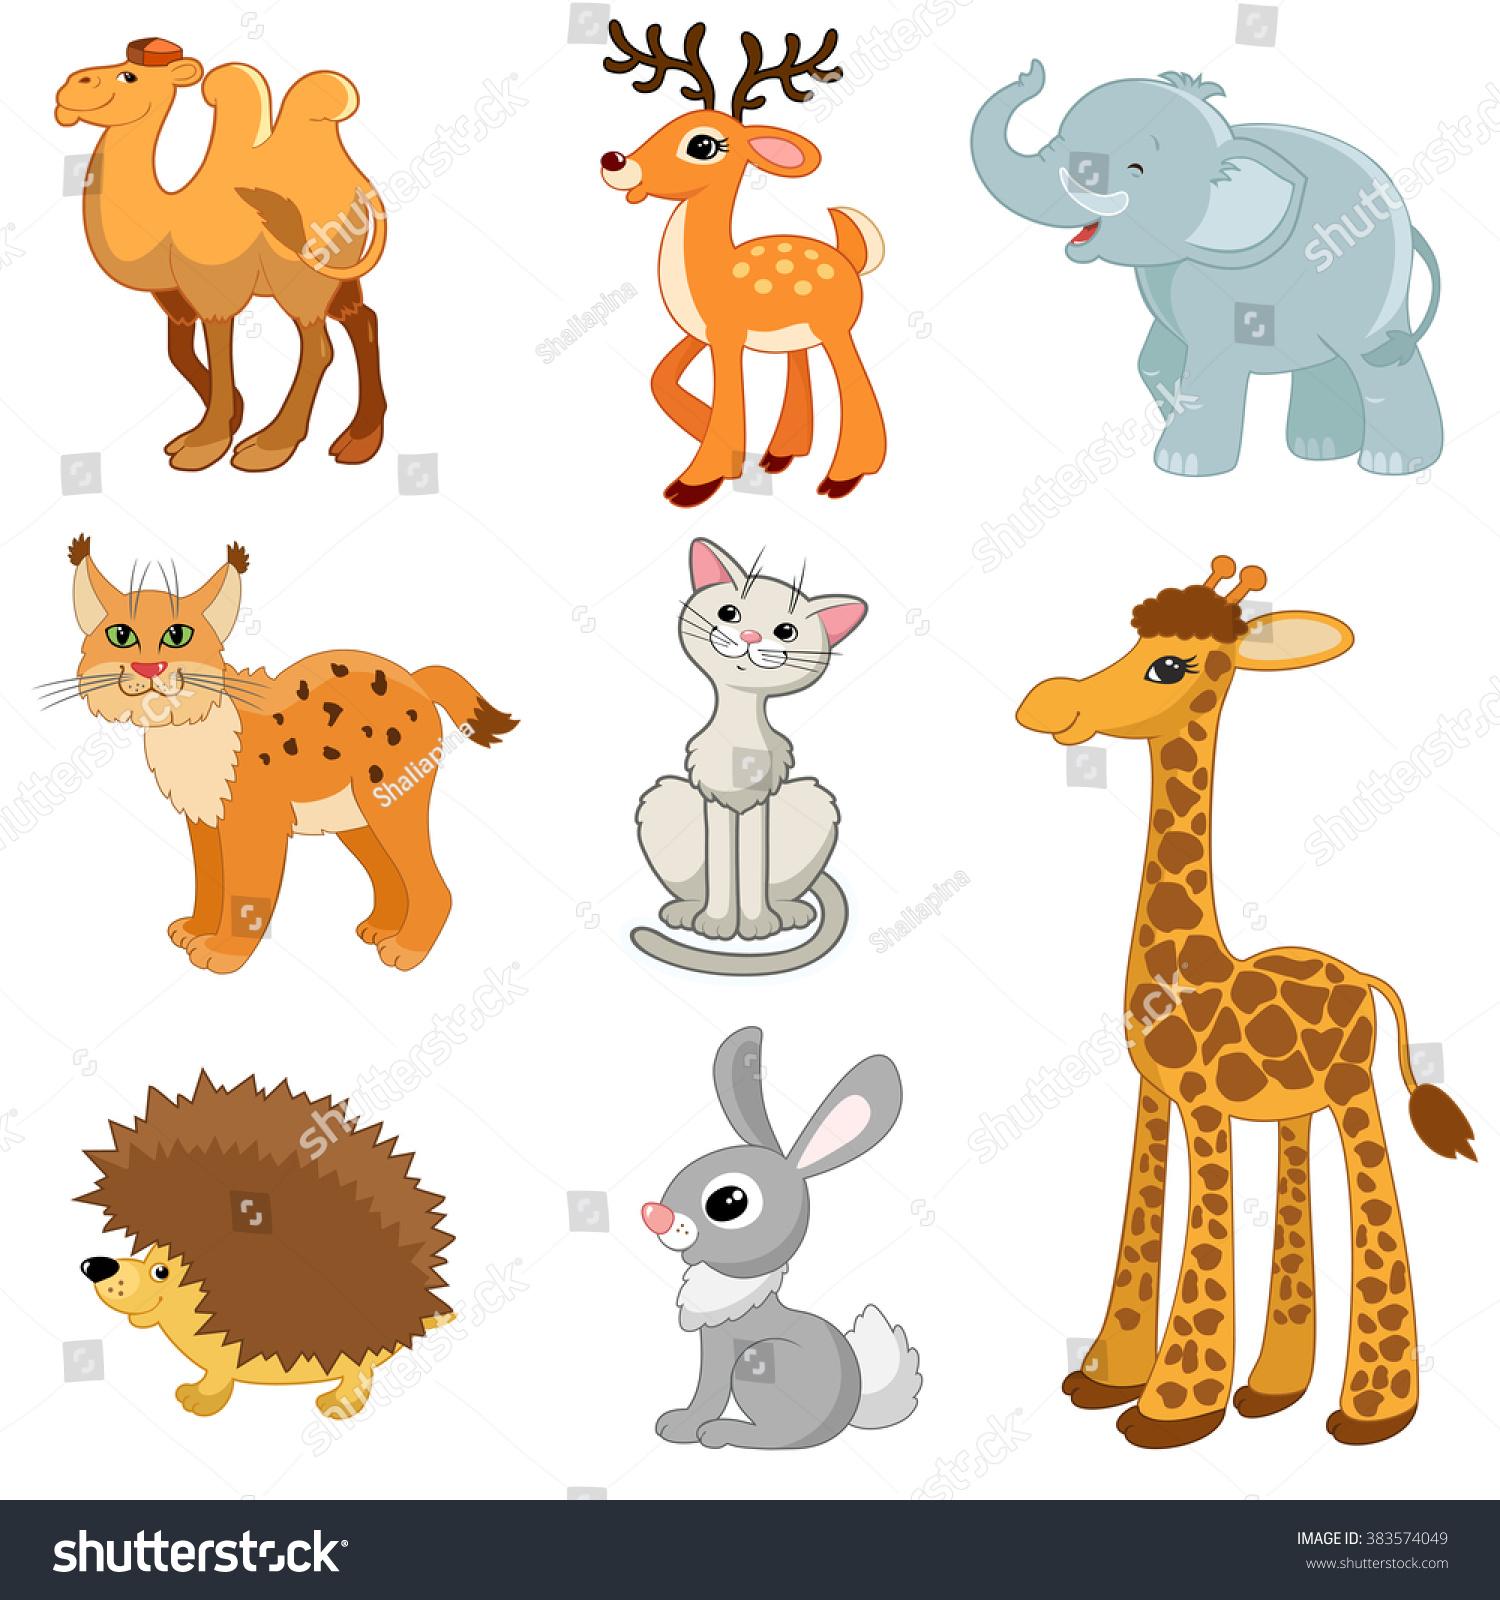 educational pictures animals camel deerelephant lynx stock vector